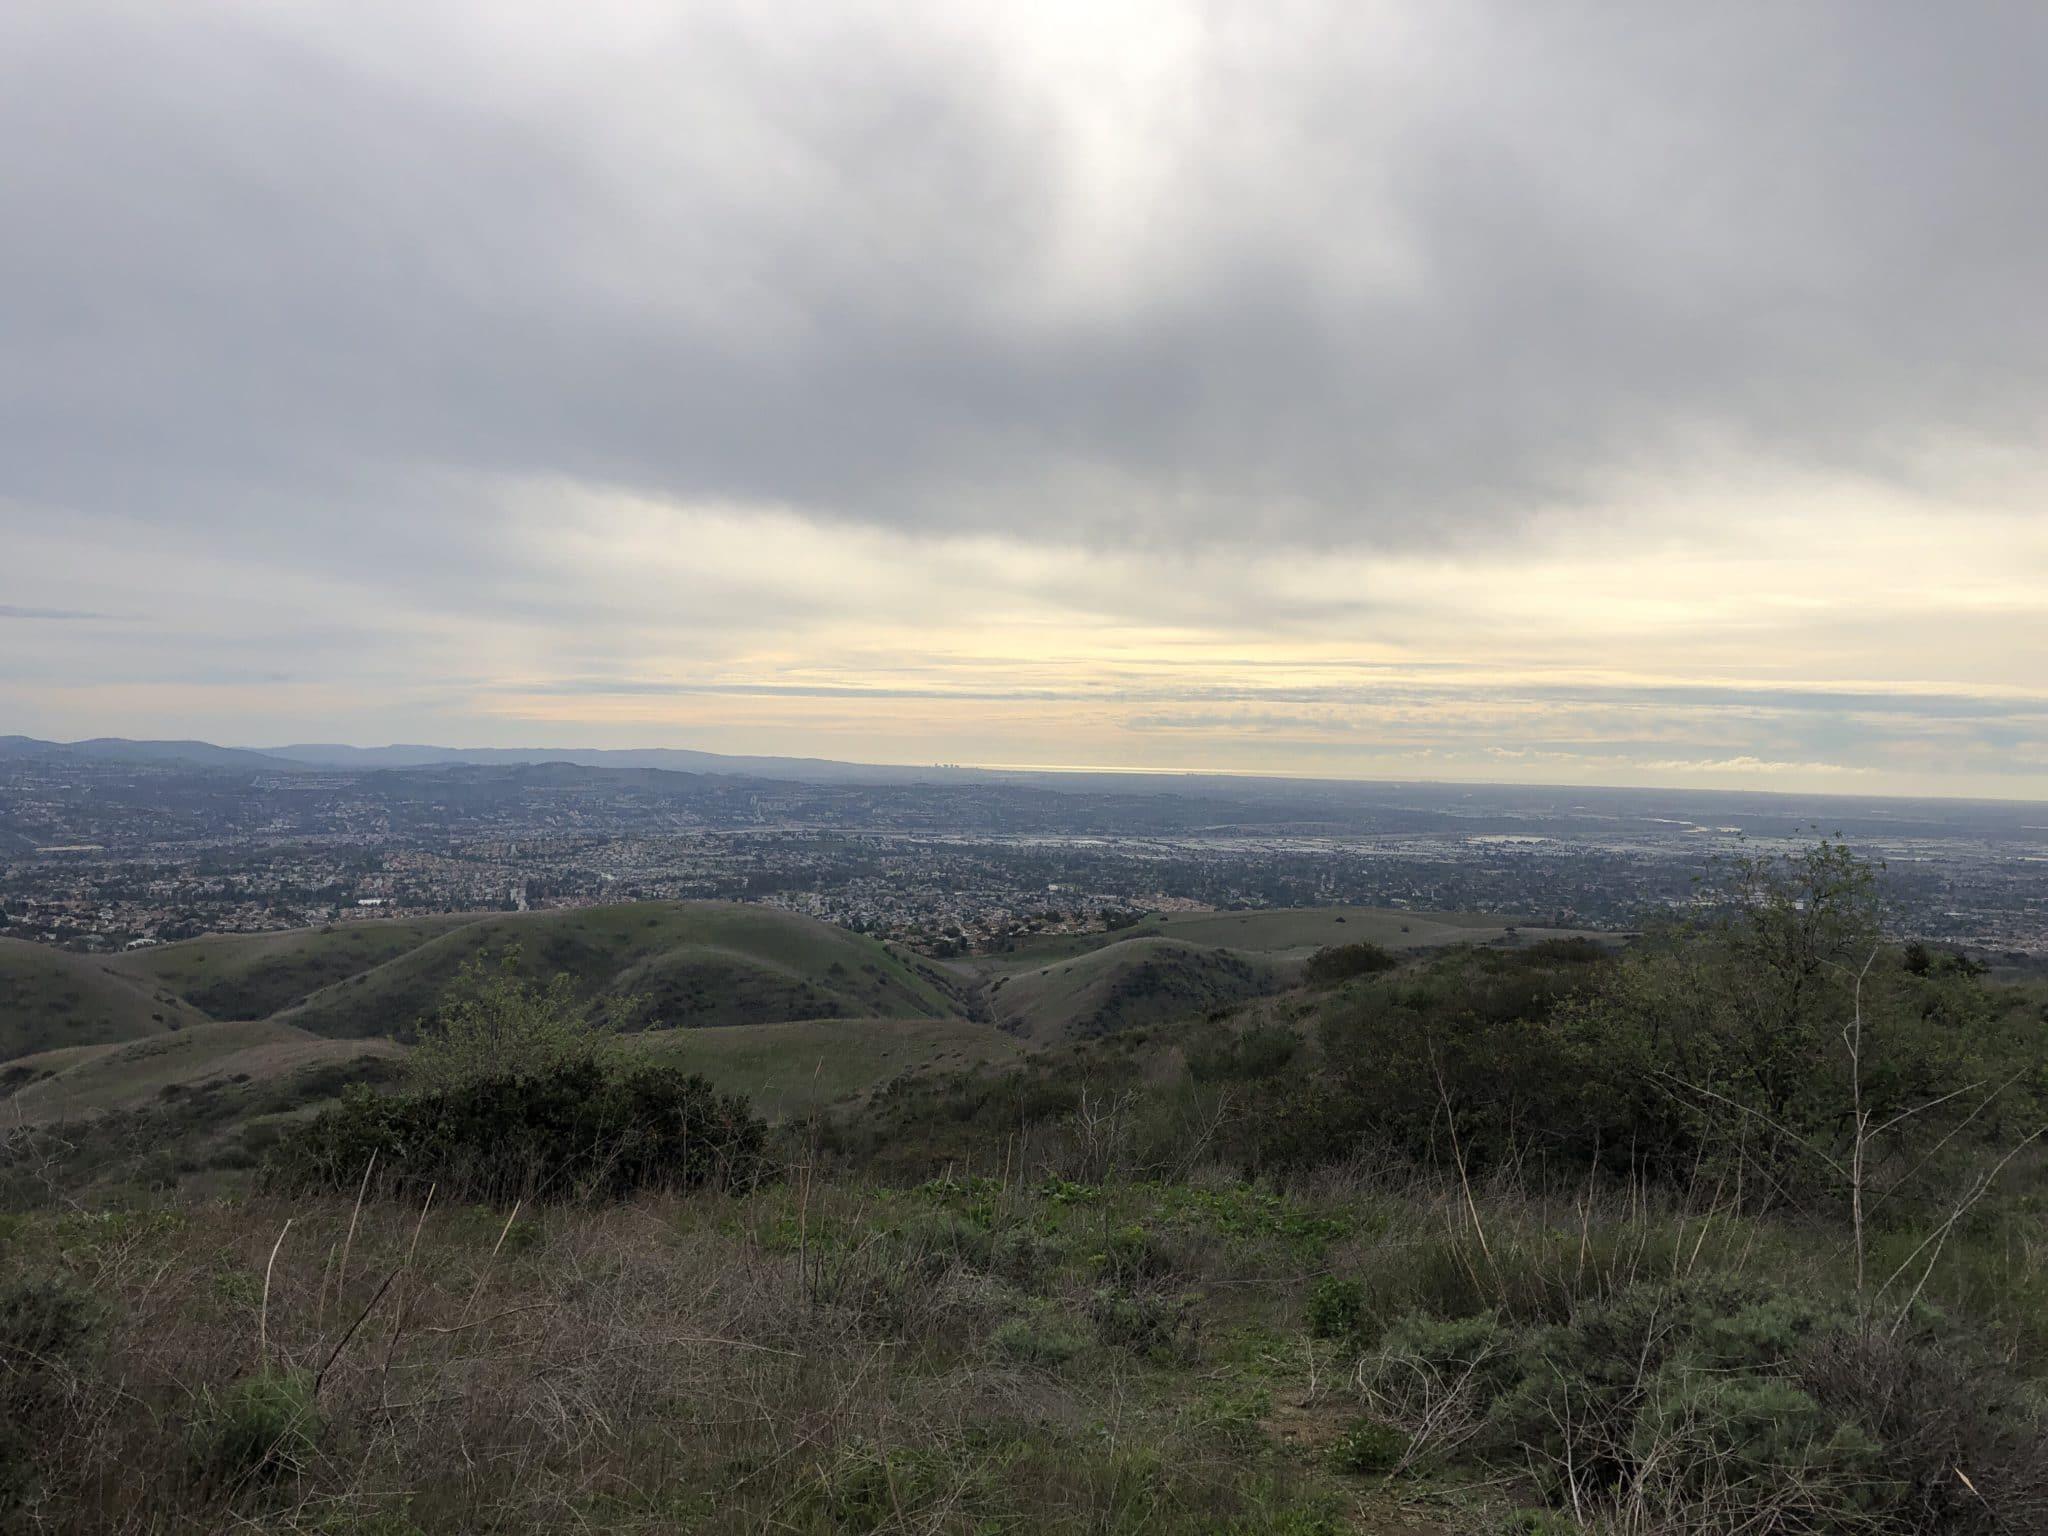 Chino Hills Park-Hike to Gilman Peak FCD5DBCD-A7E8-4DE3-838D-45AFC61BDDB4CC59EB6F-1159-4242-9C26-E30